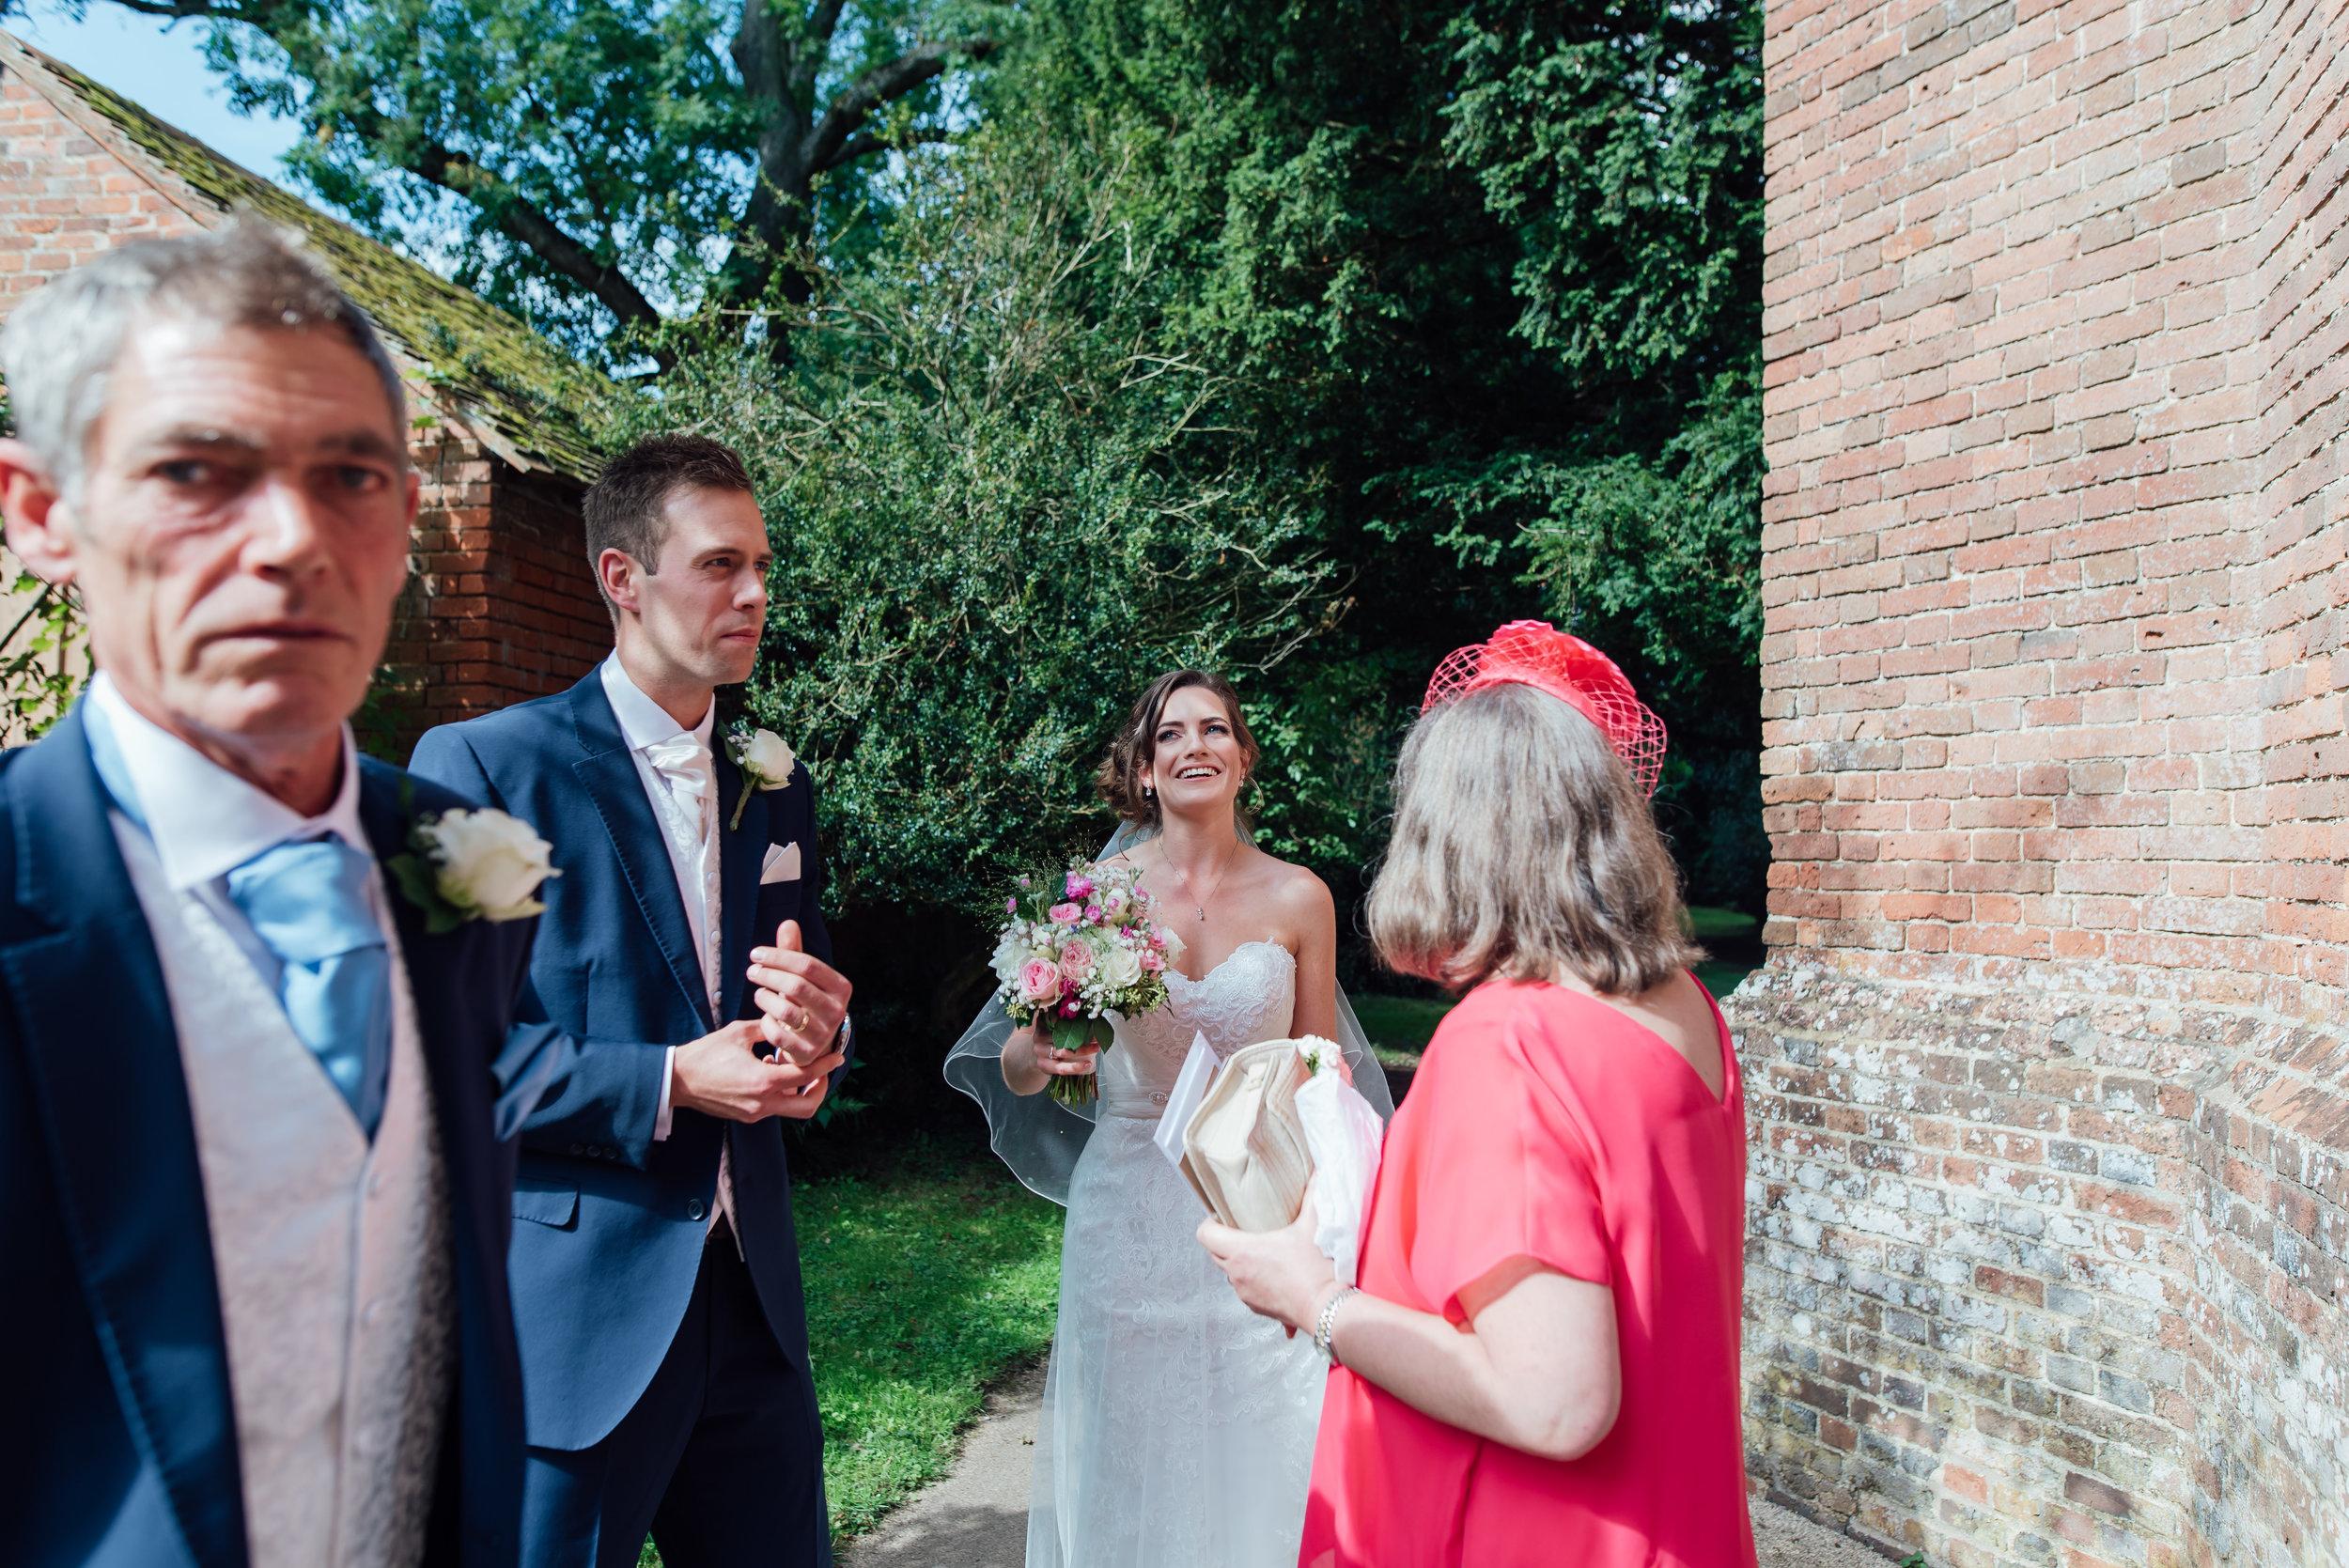 rotherwick-villgae-hall-wedding / Hampshire-village-hall-wedding / Amy-james-photography